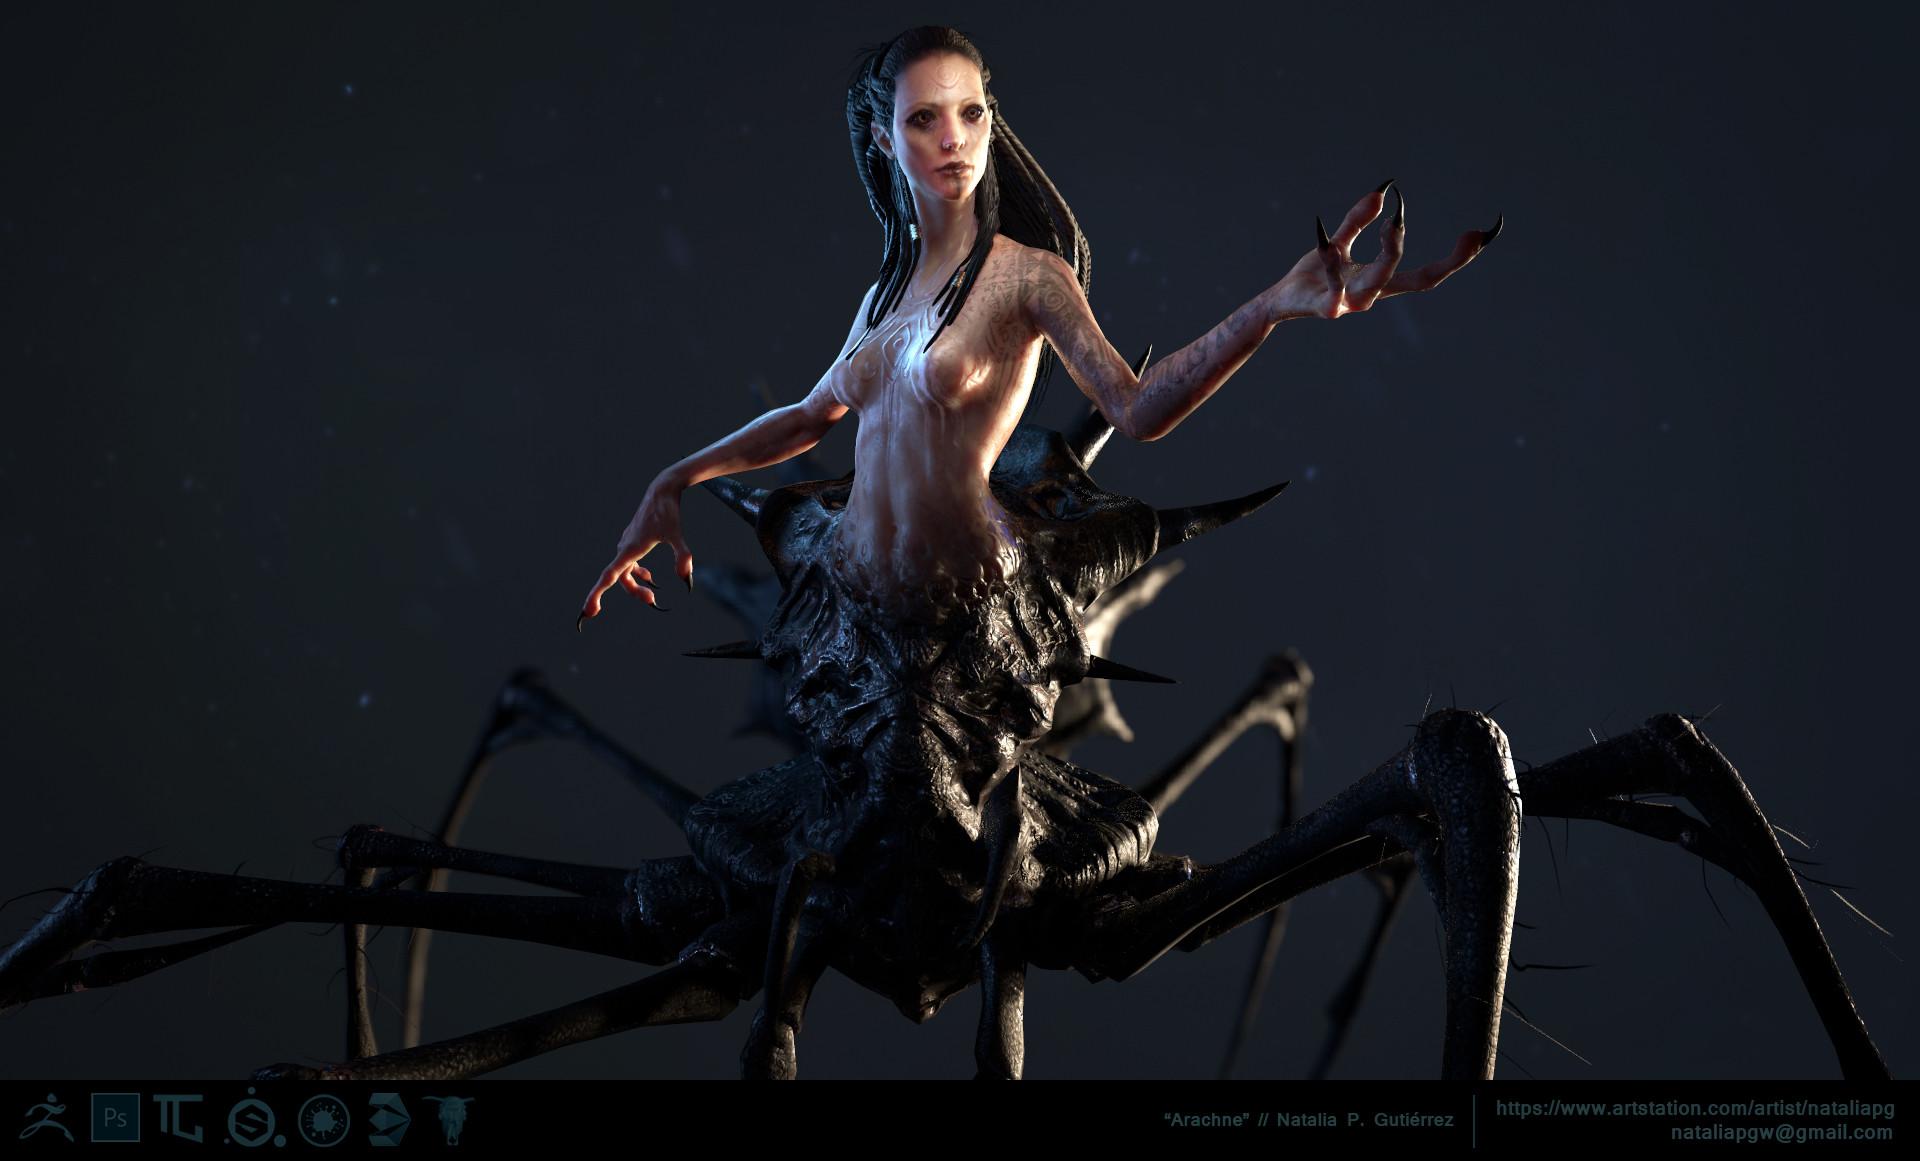 Natalia p gutierrez arachneview 9